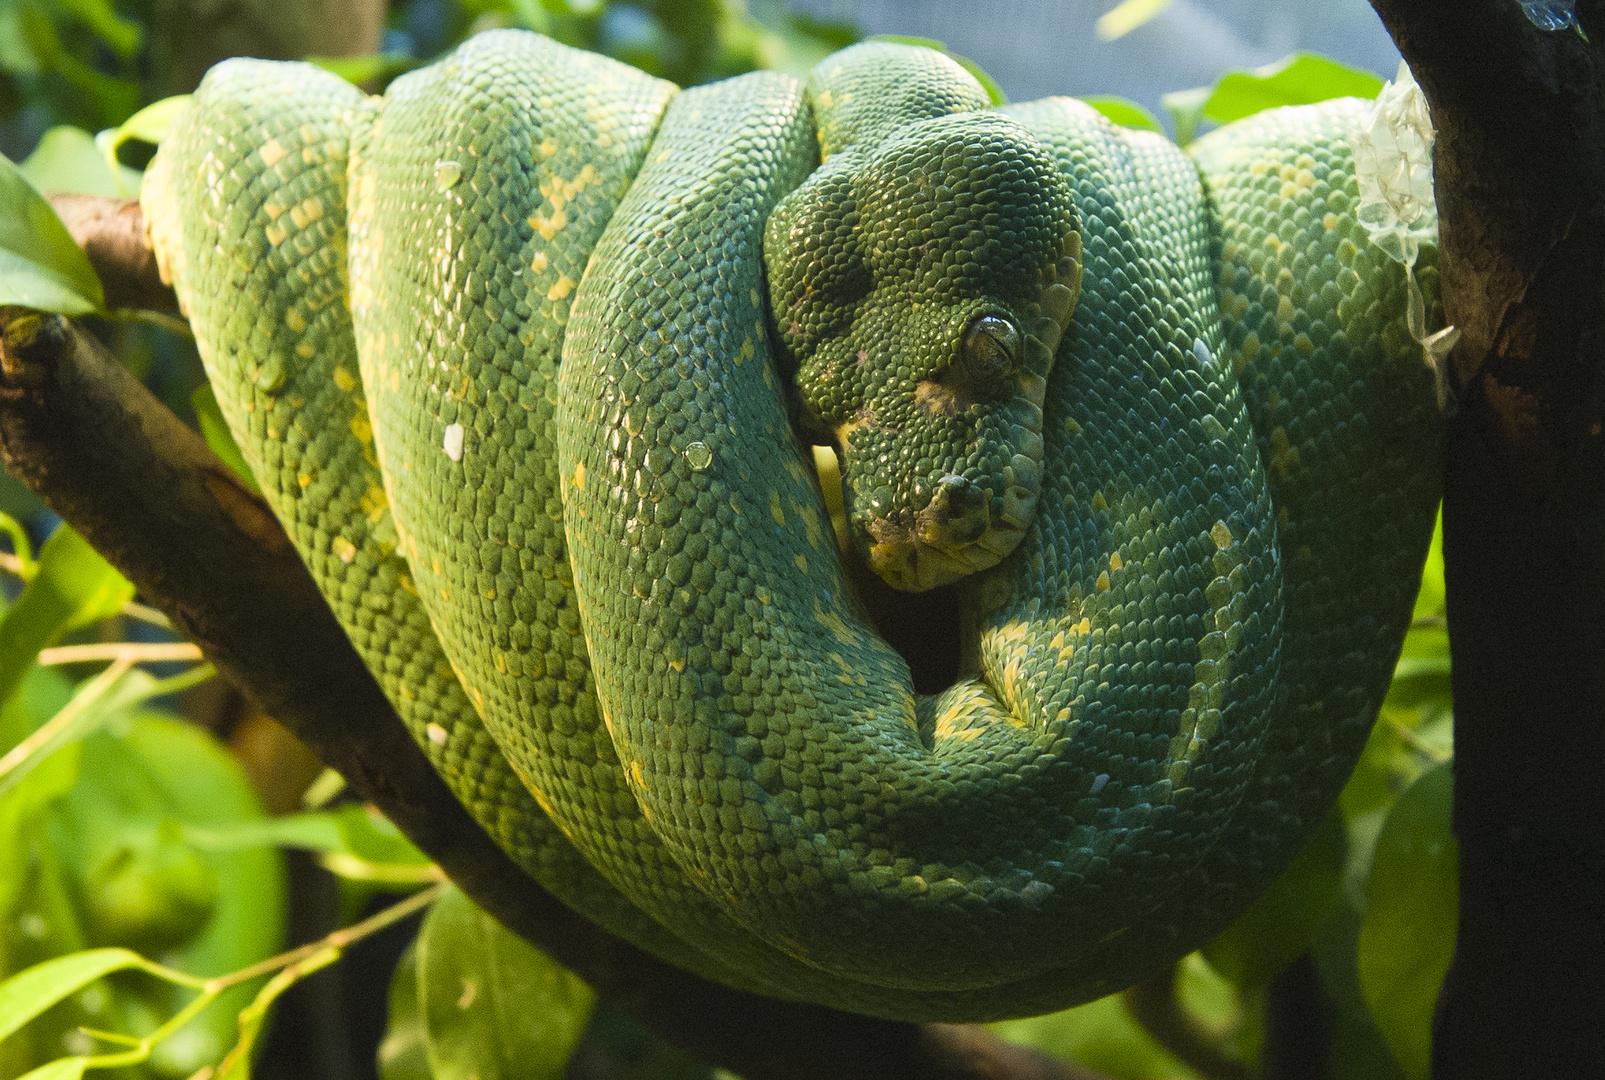 Grüner Baum Python - Green Tree Python - Morelia viridis